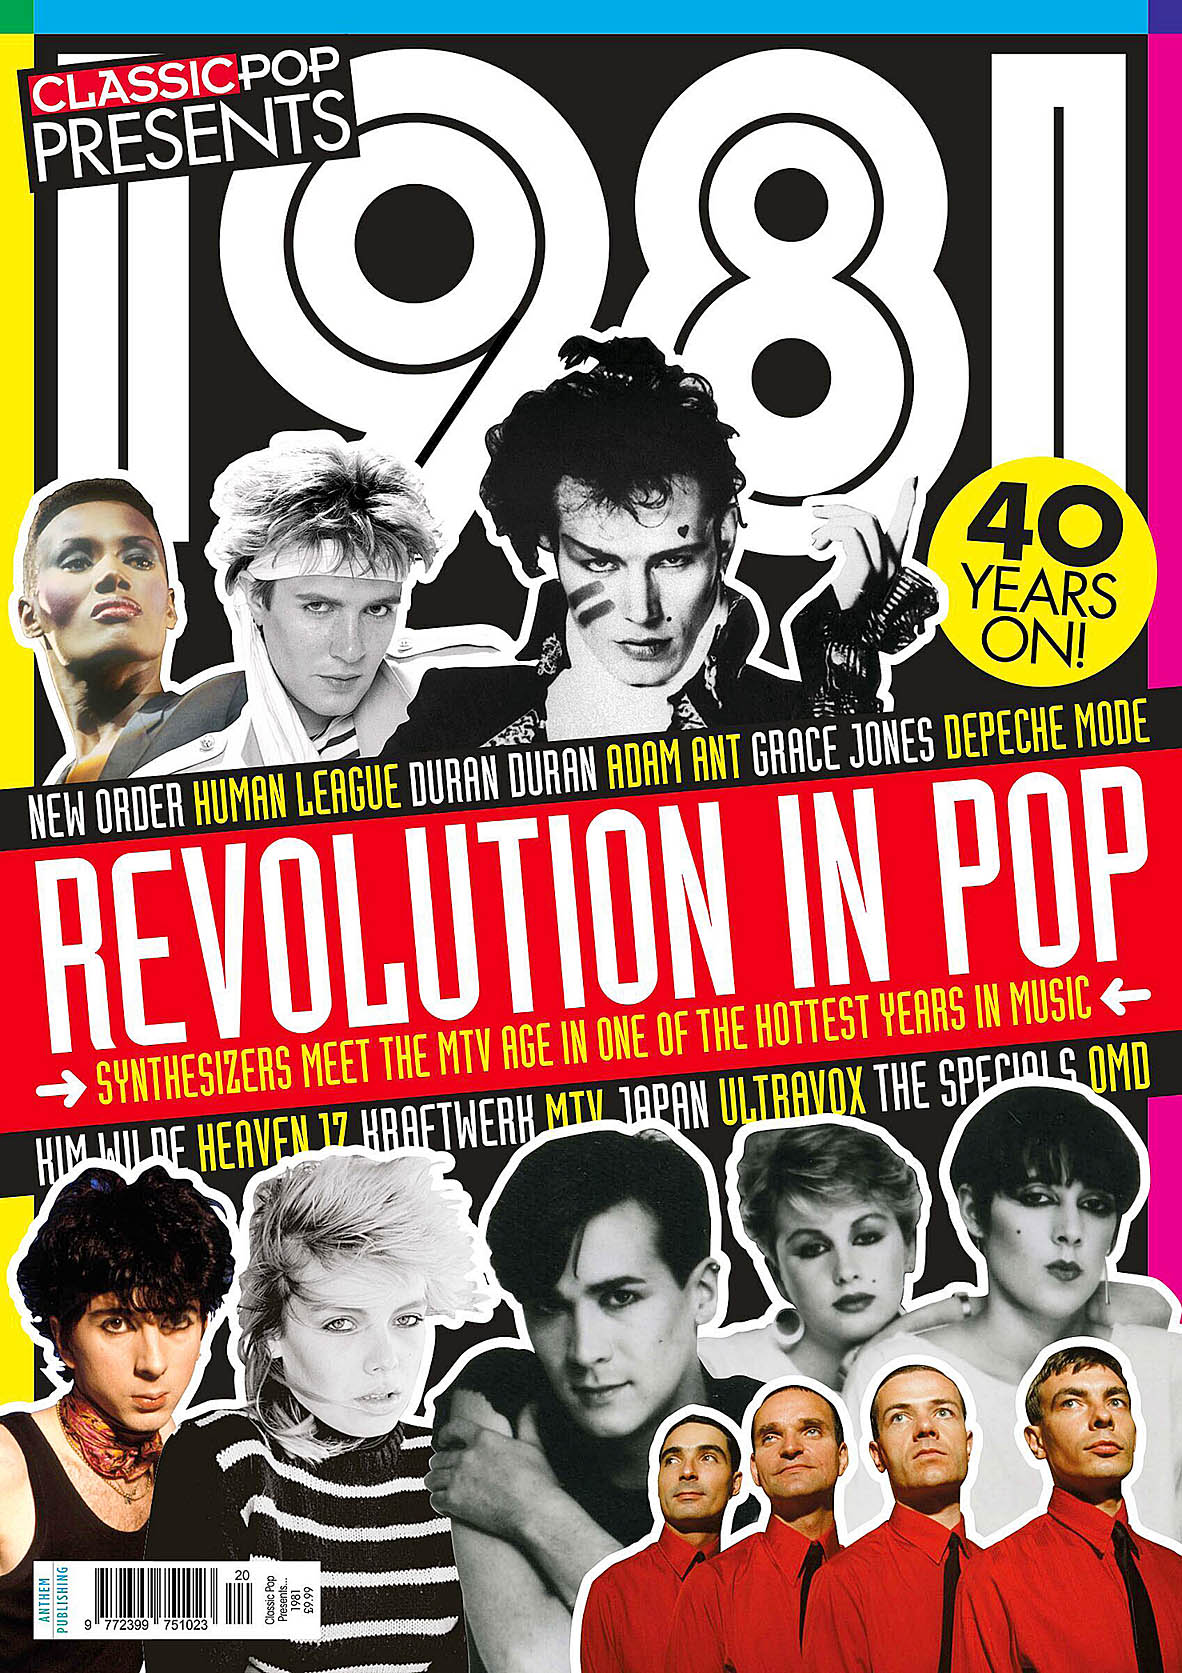 Classic Pop Sp 1981.jpg